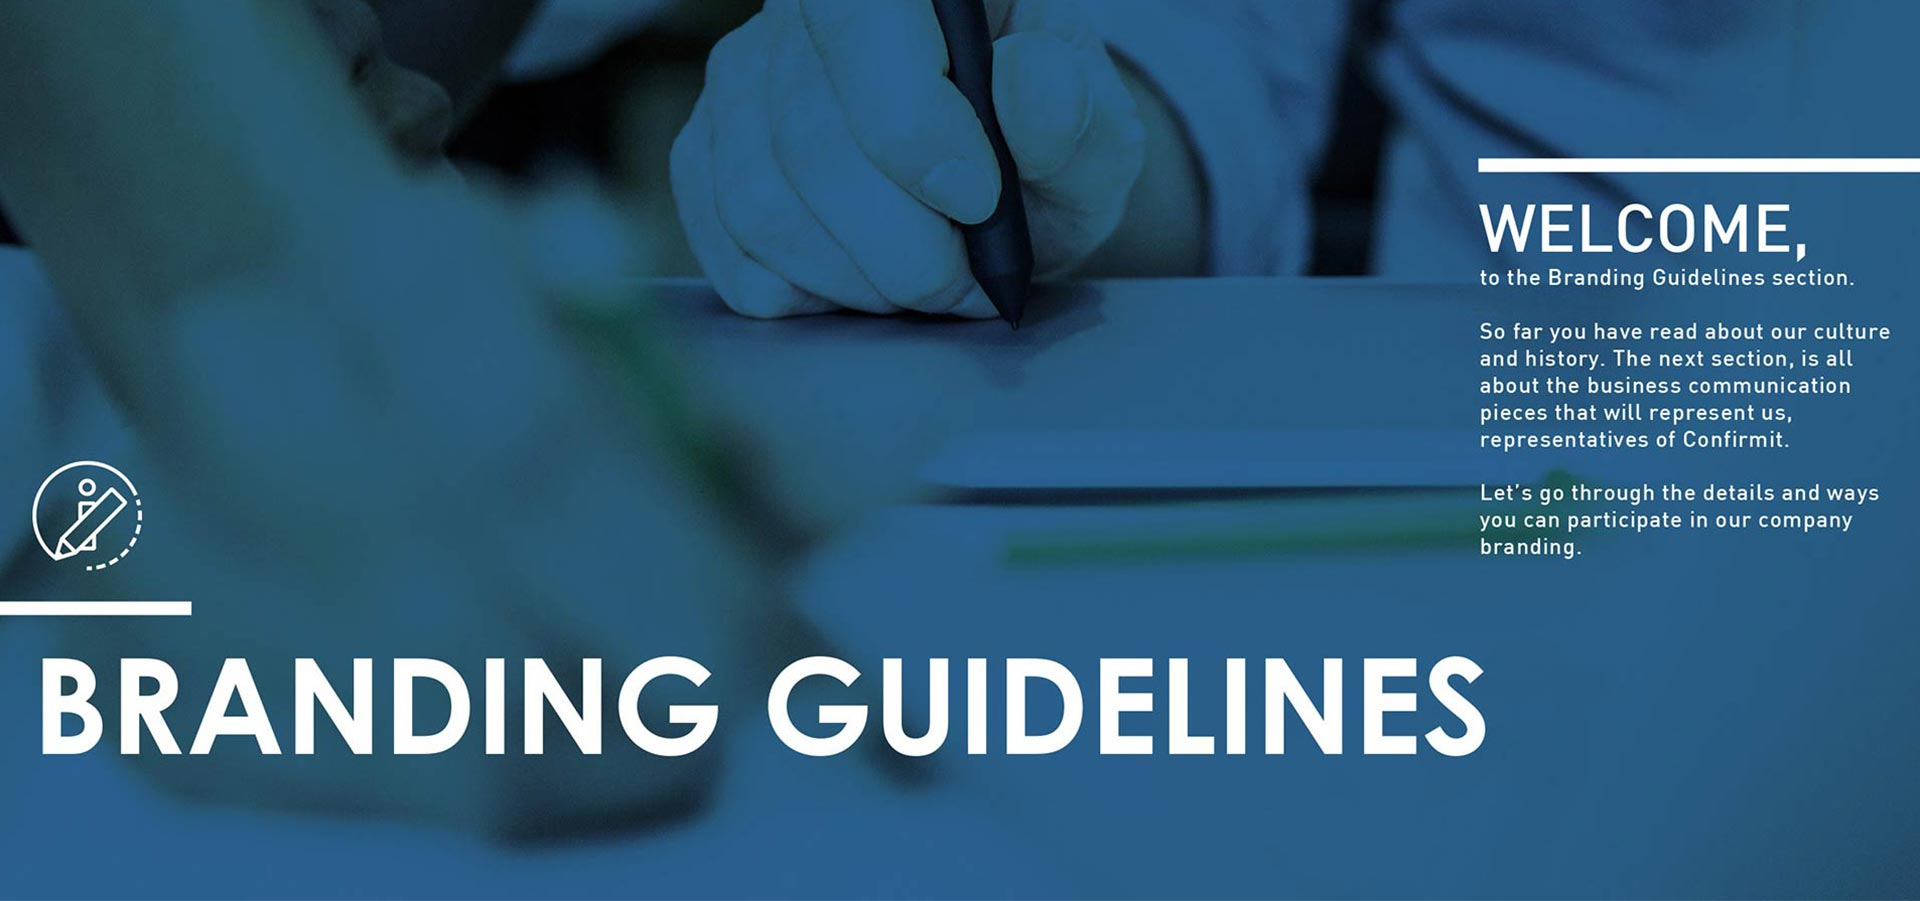 Confirmit branding guidelines banner.